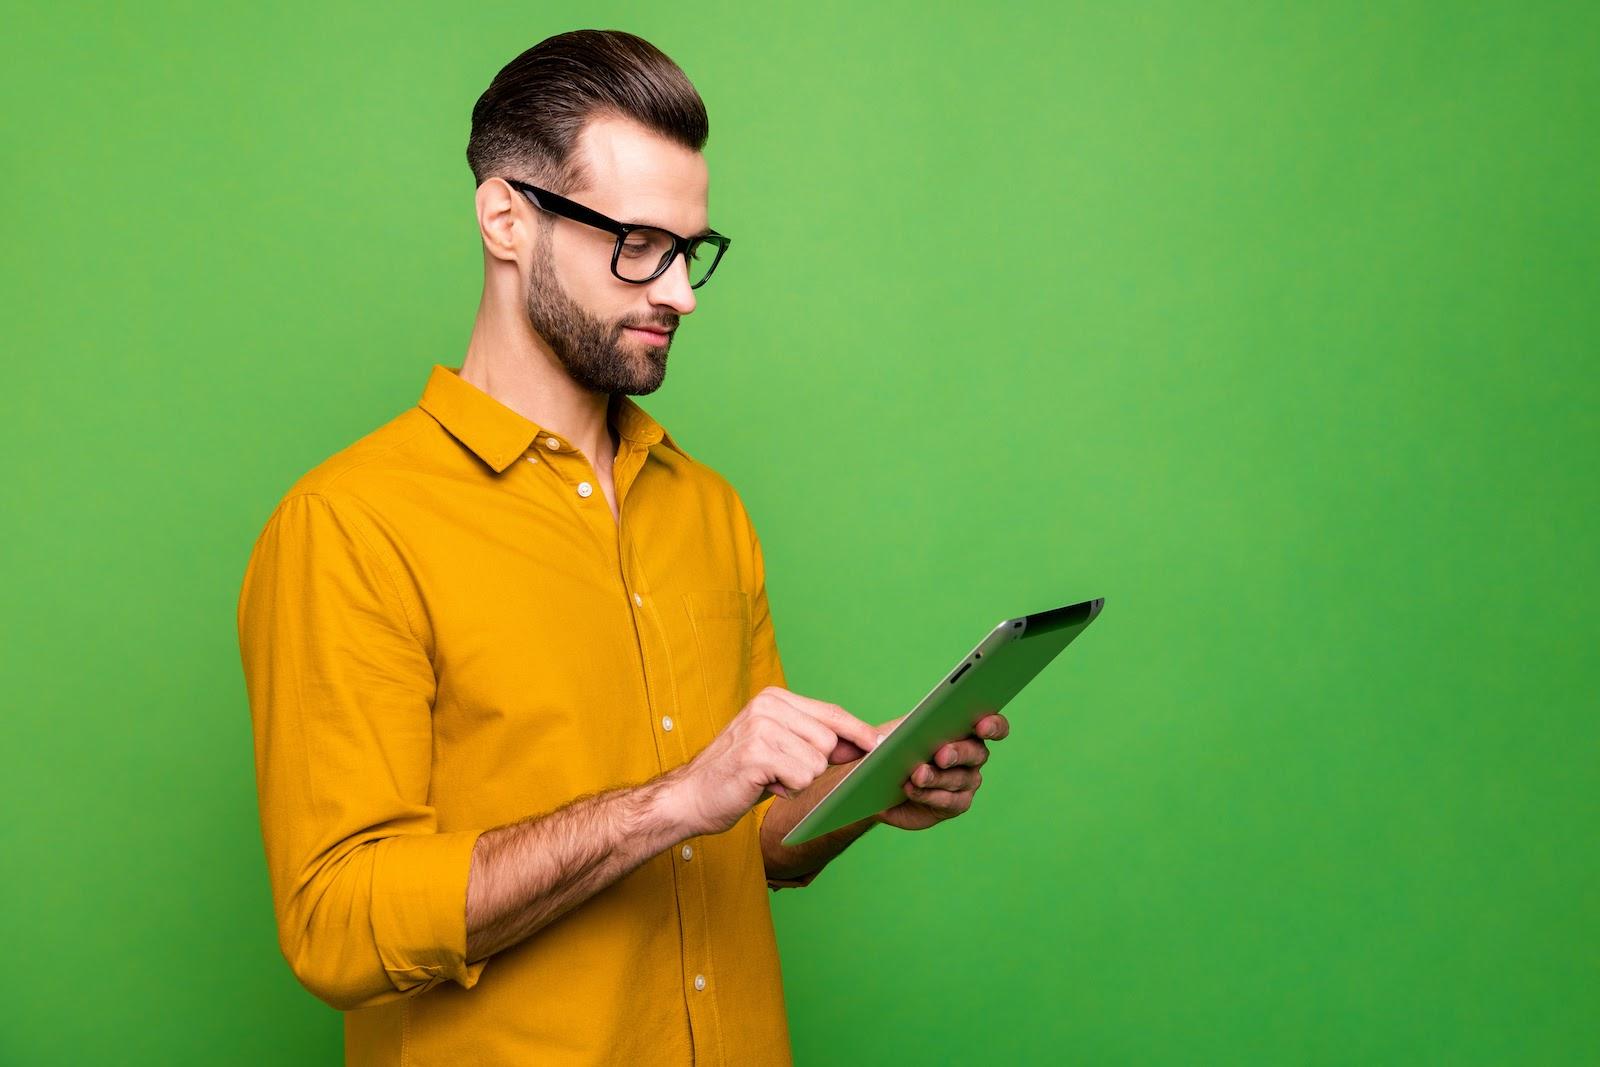 A man uses a virtual event platform on a tablet